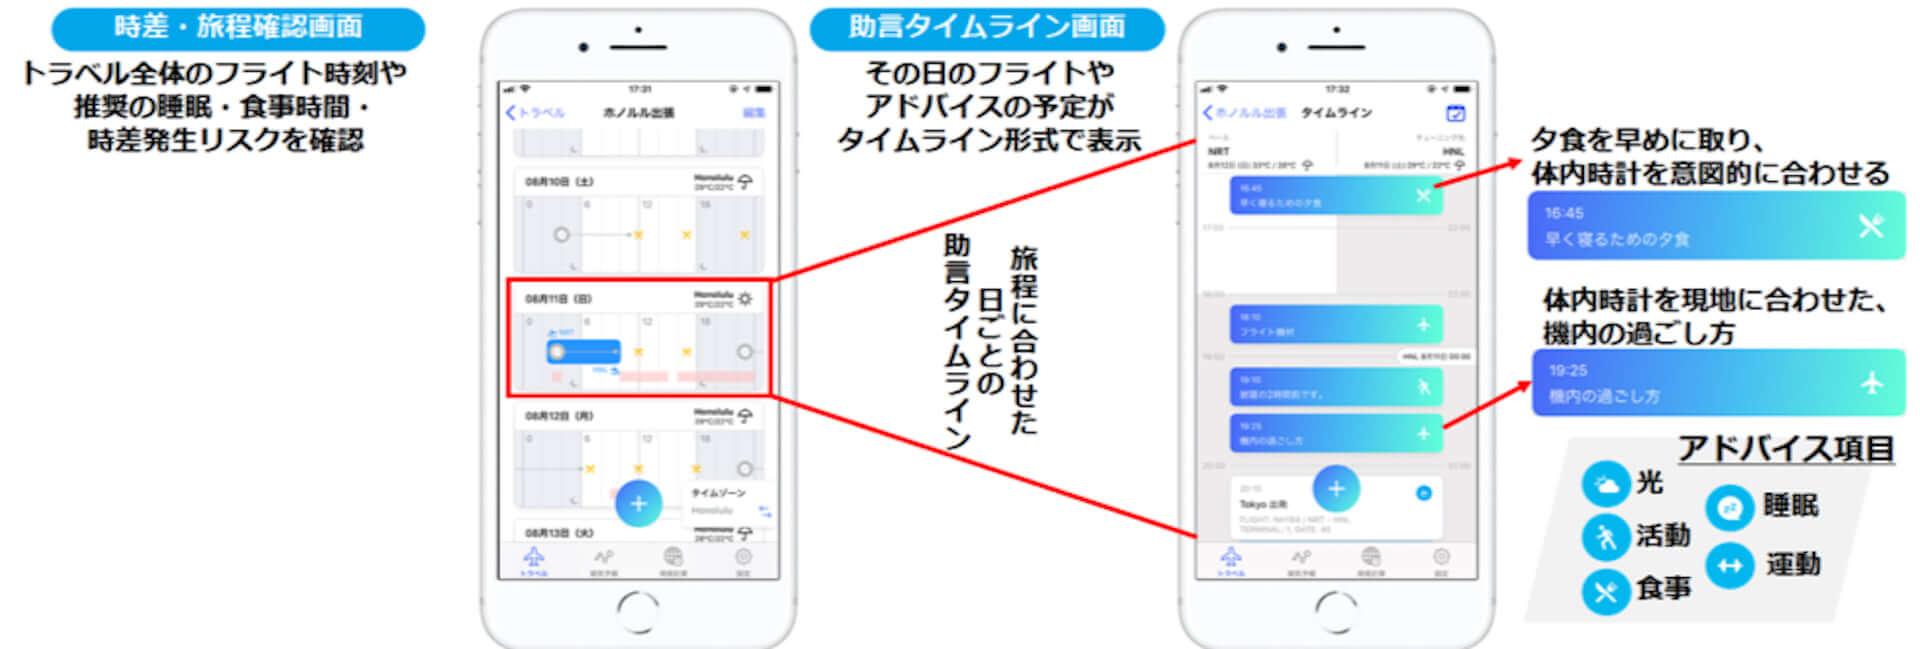 ANAから時差ボケを調整できるアプリが登場!? tech190820_ana_timelag_app_2-1920x649